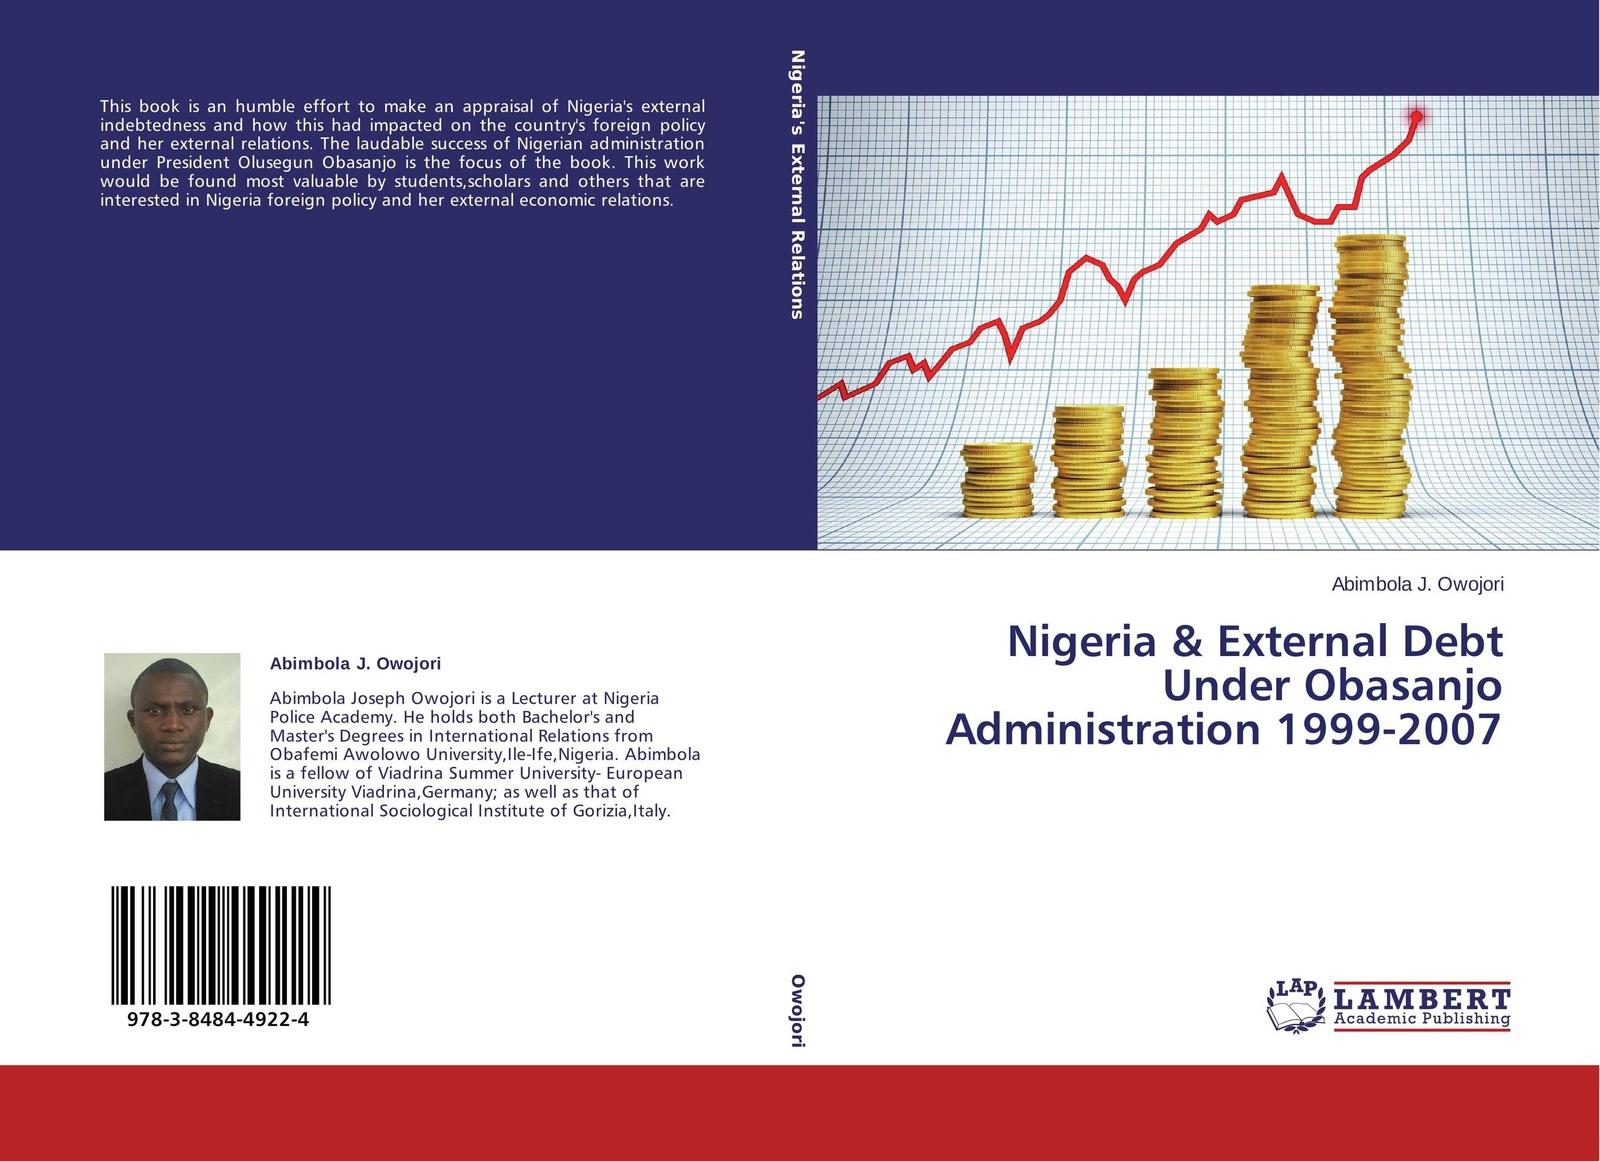 Abimbola J. Owojori Nigeria & External Debt Under Obasanjo Administration 1999-2007 ernest udalla public policy in nigeria s fourth republic 1999 2010